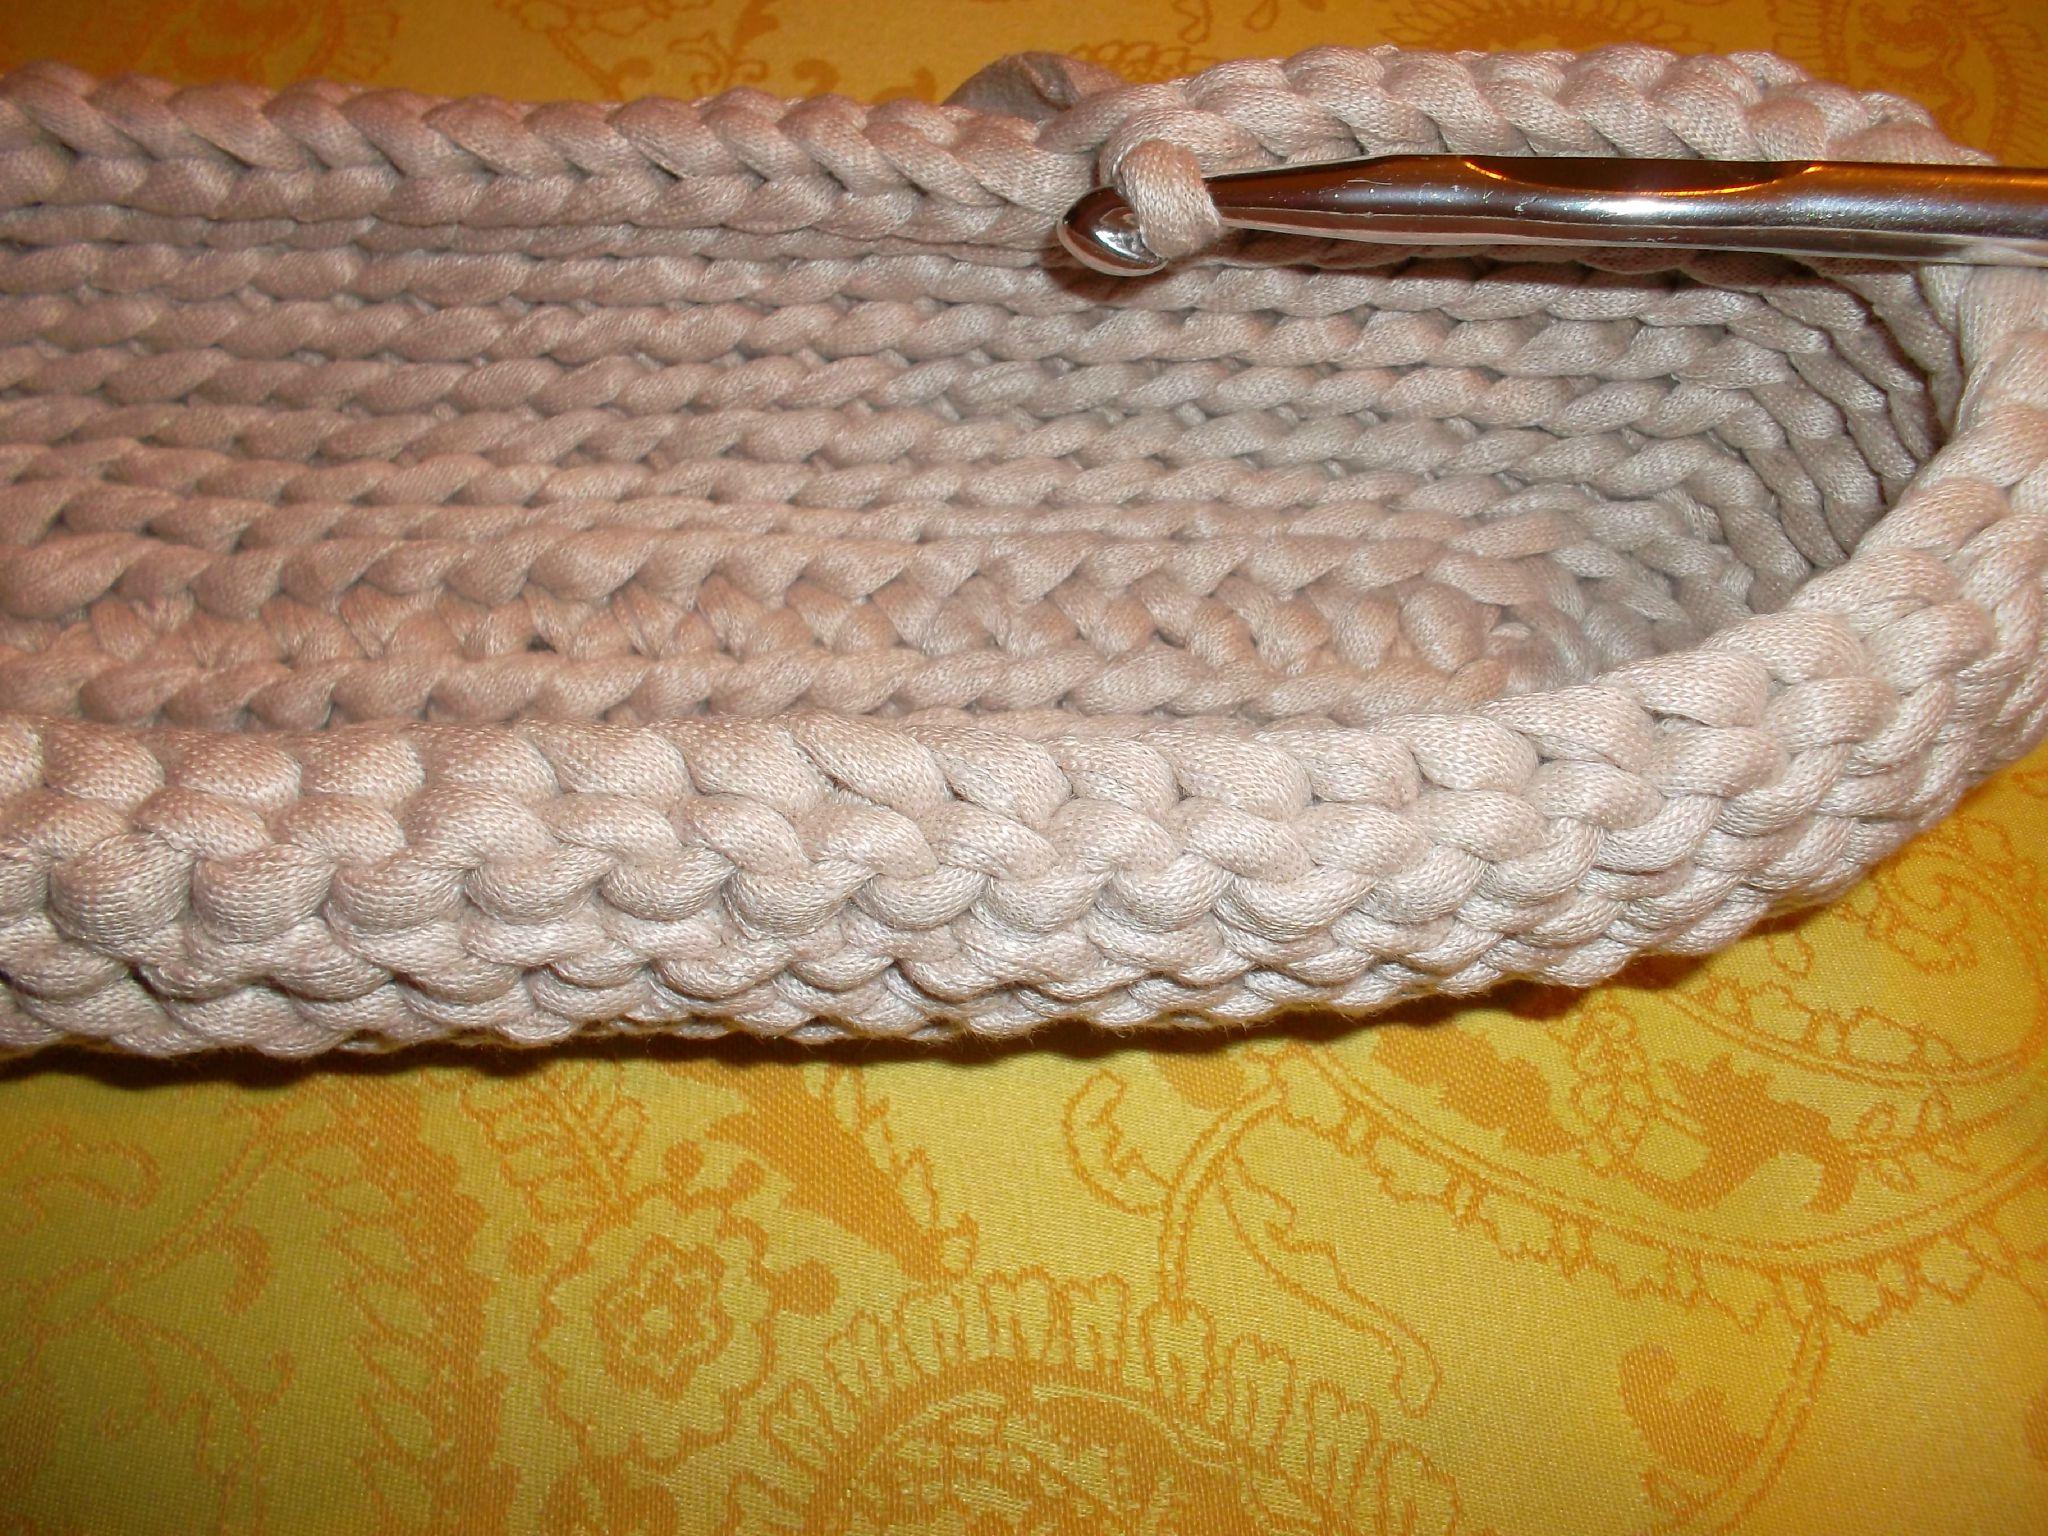 Tuto sac a main zpagetti bullard - Tuto pour creer un sac en crochet ...